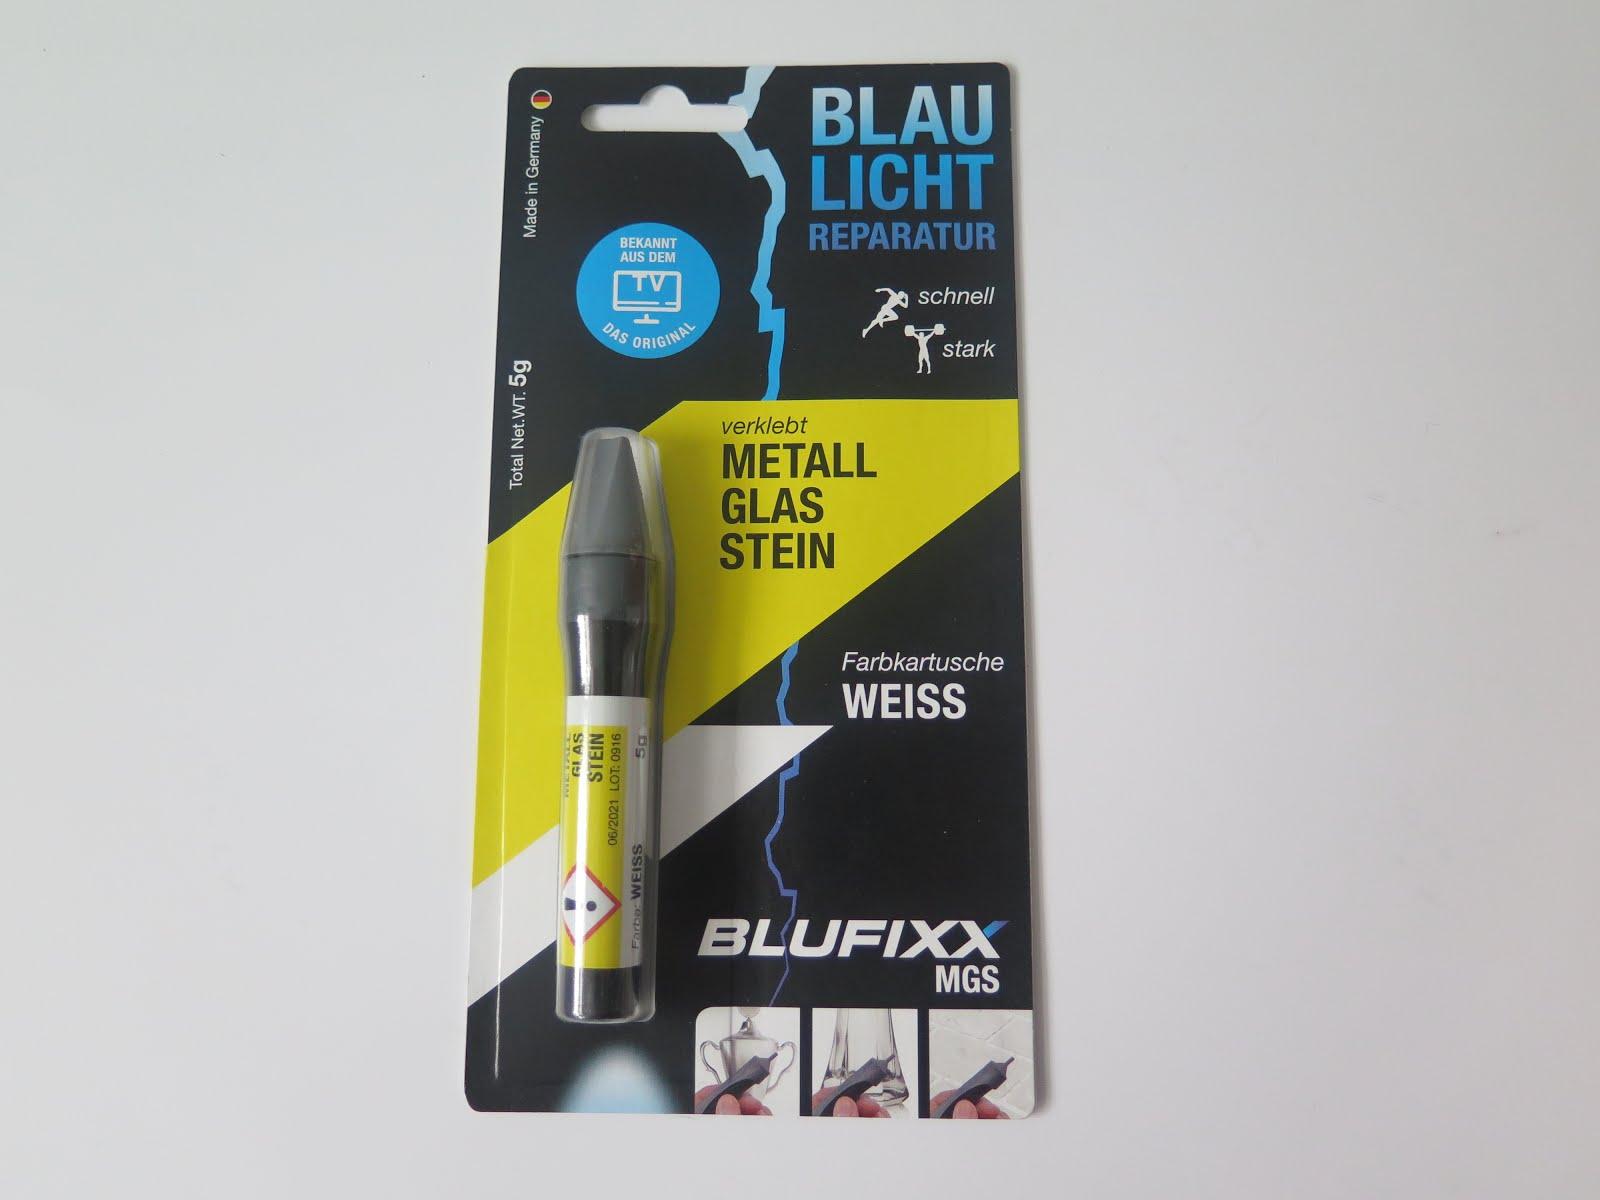 blufixx kleben licht an fertig tante reenes testfamilie. Black Bedroom Furniture Sets. Home Design Ideas